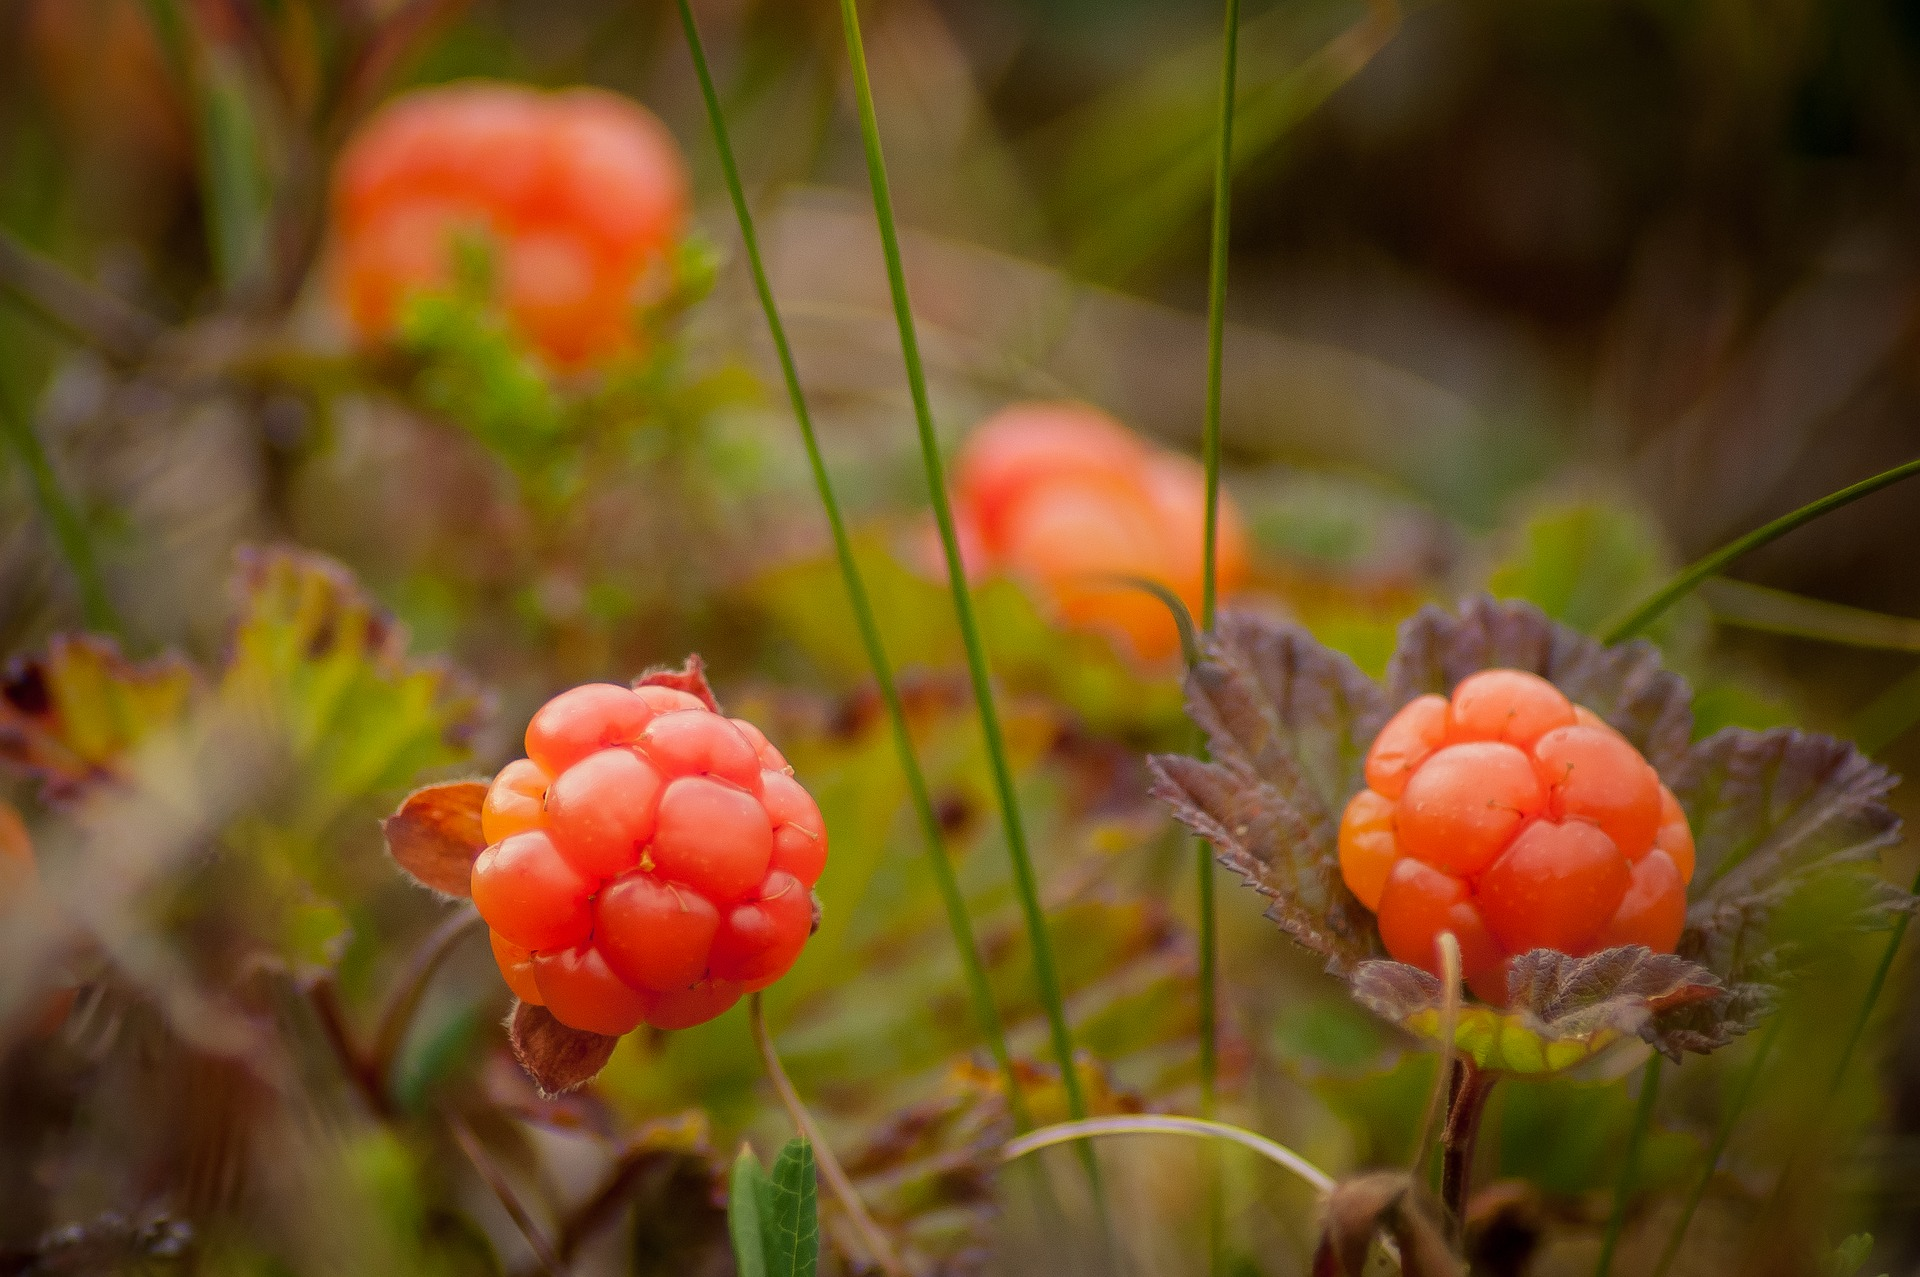 cloudberry-bush-produces-2130046_1920.jpg